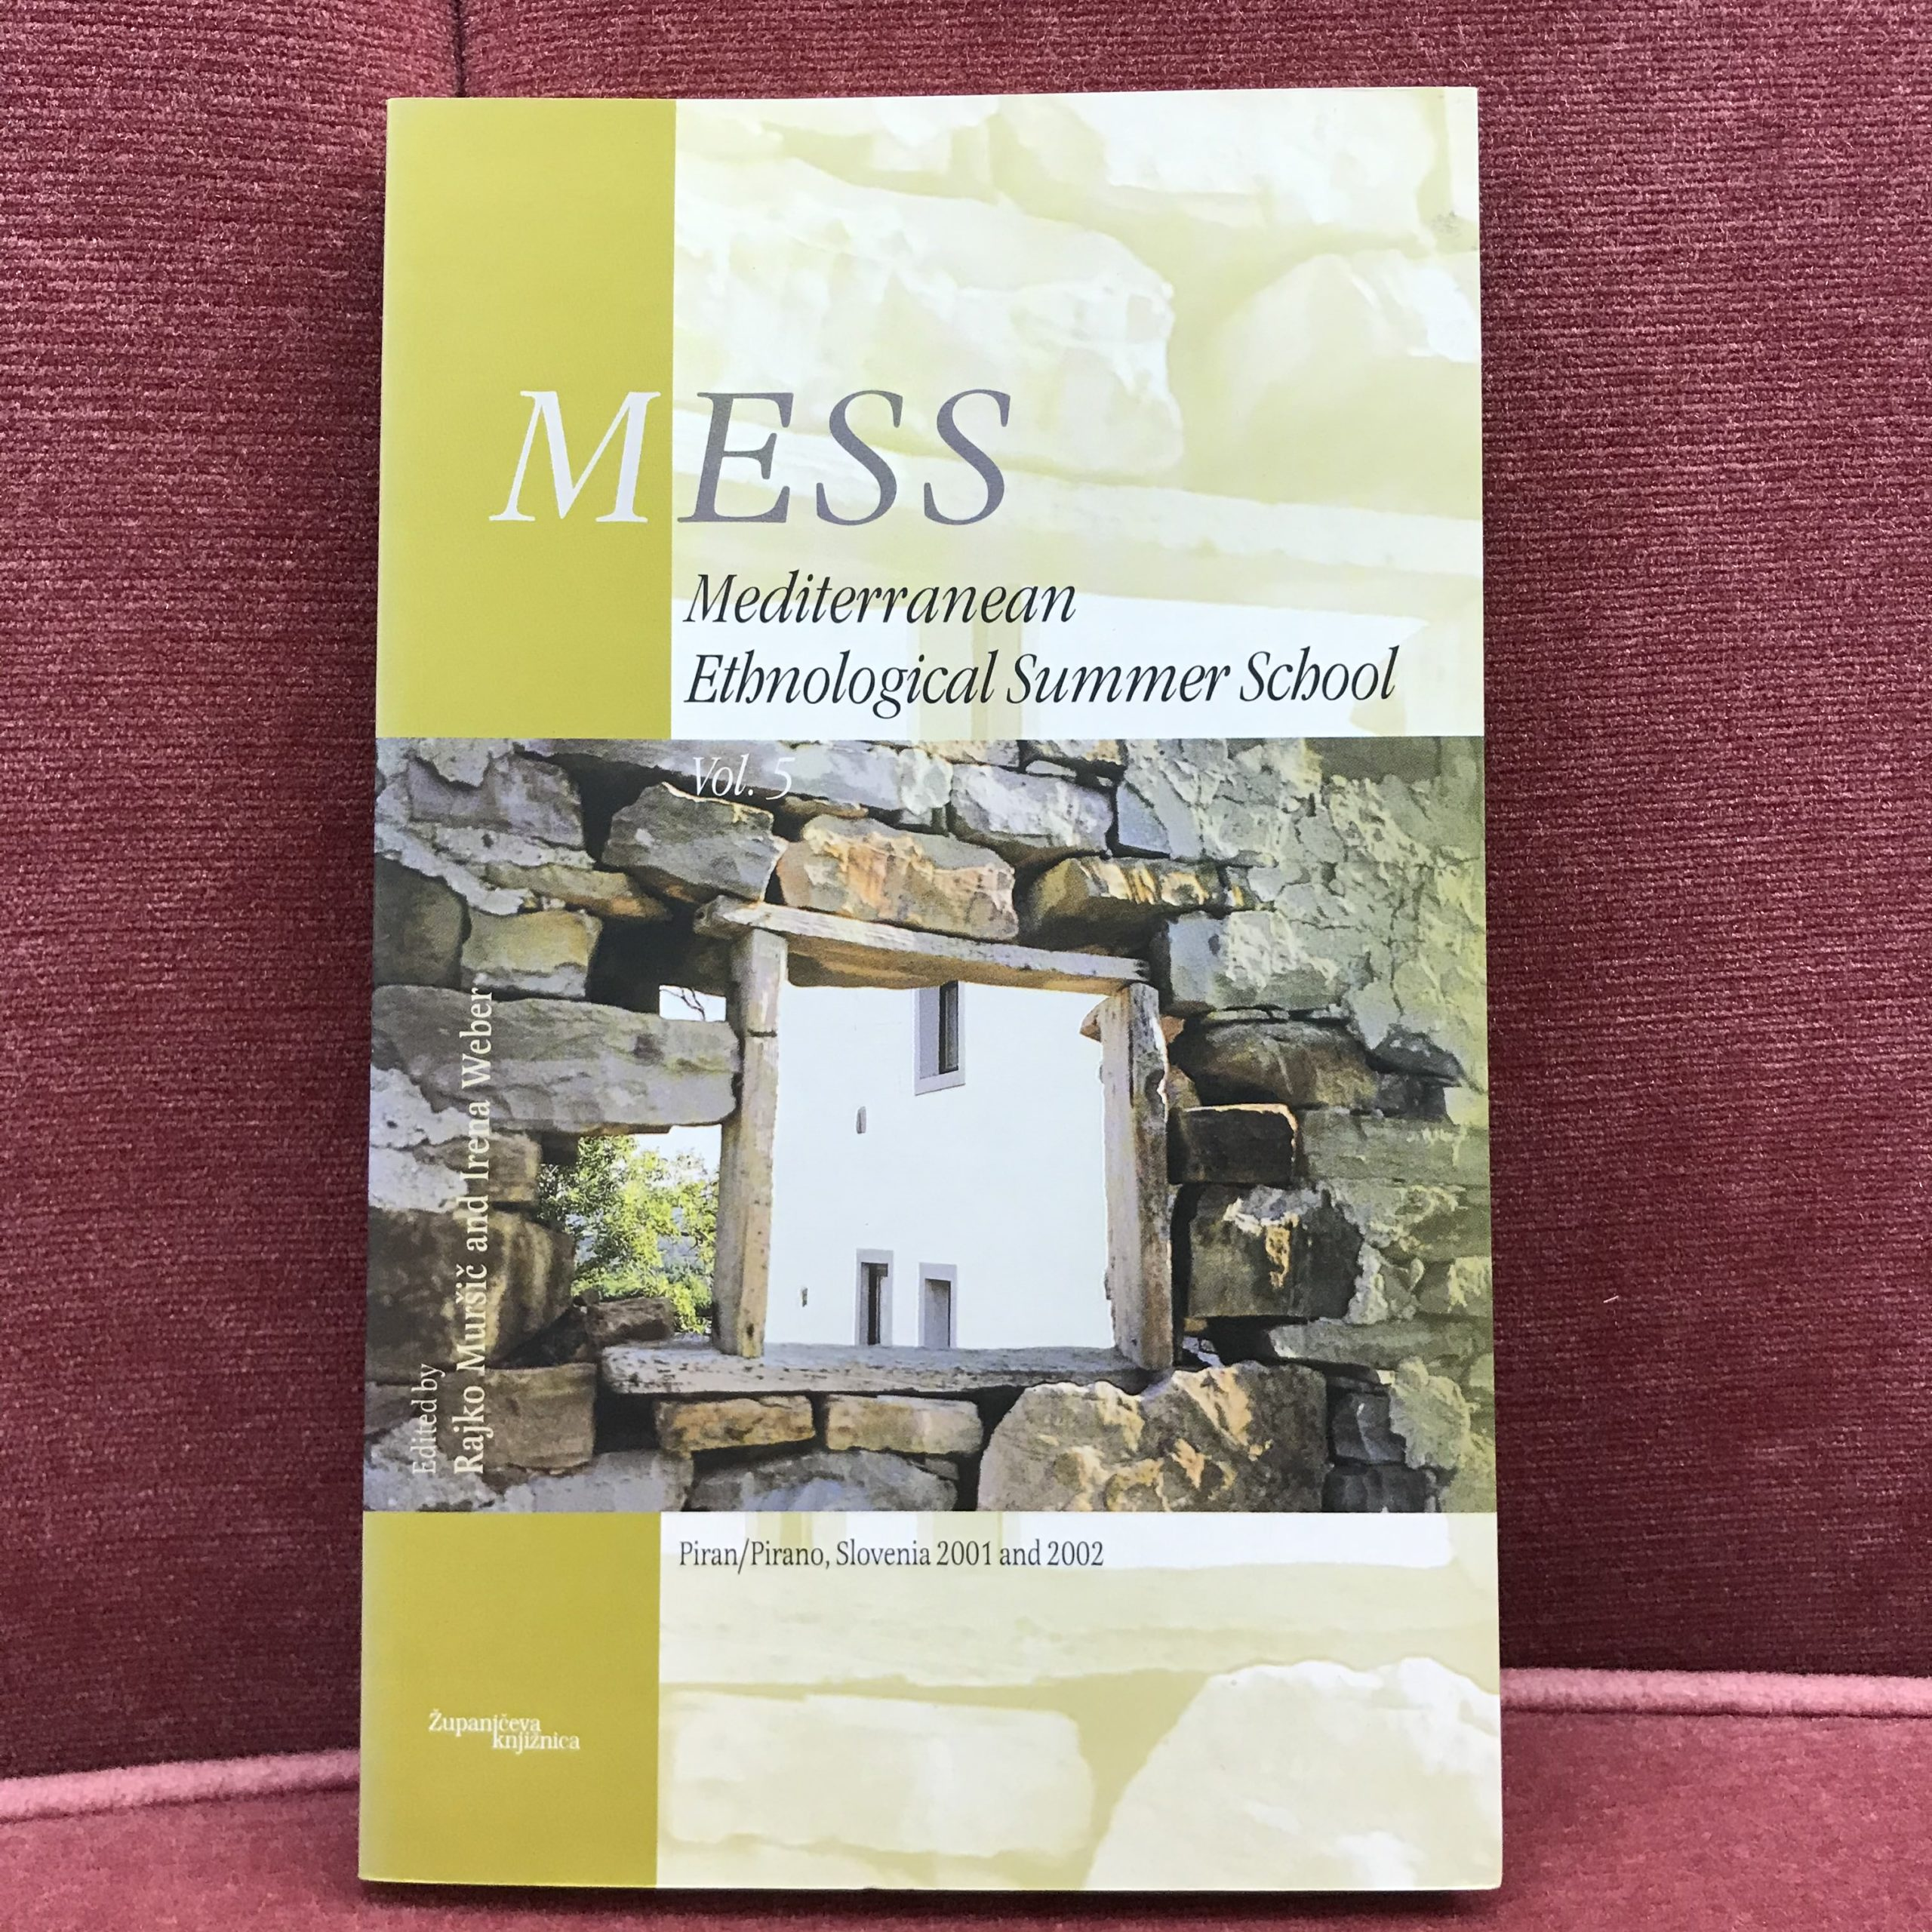 MESS- Mediterranean Ethnological Summer School Vol.5